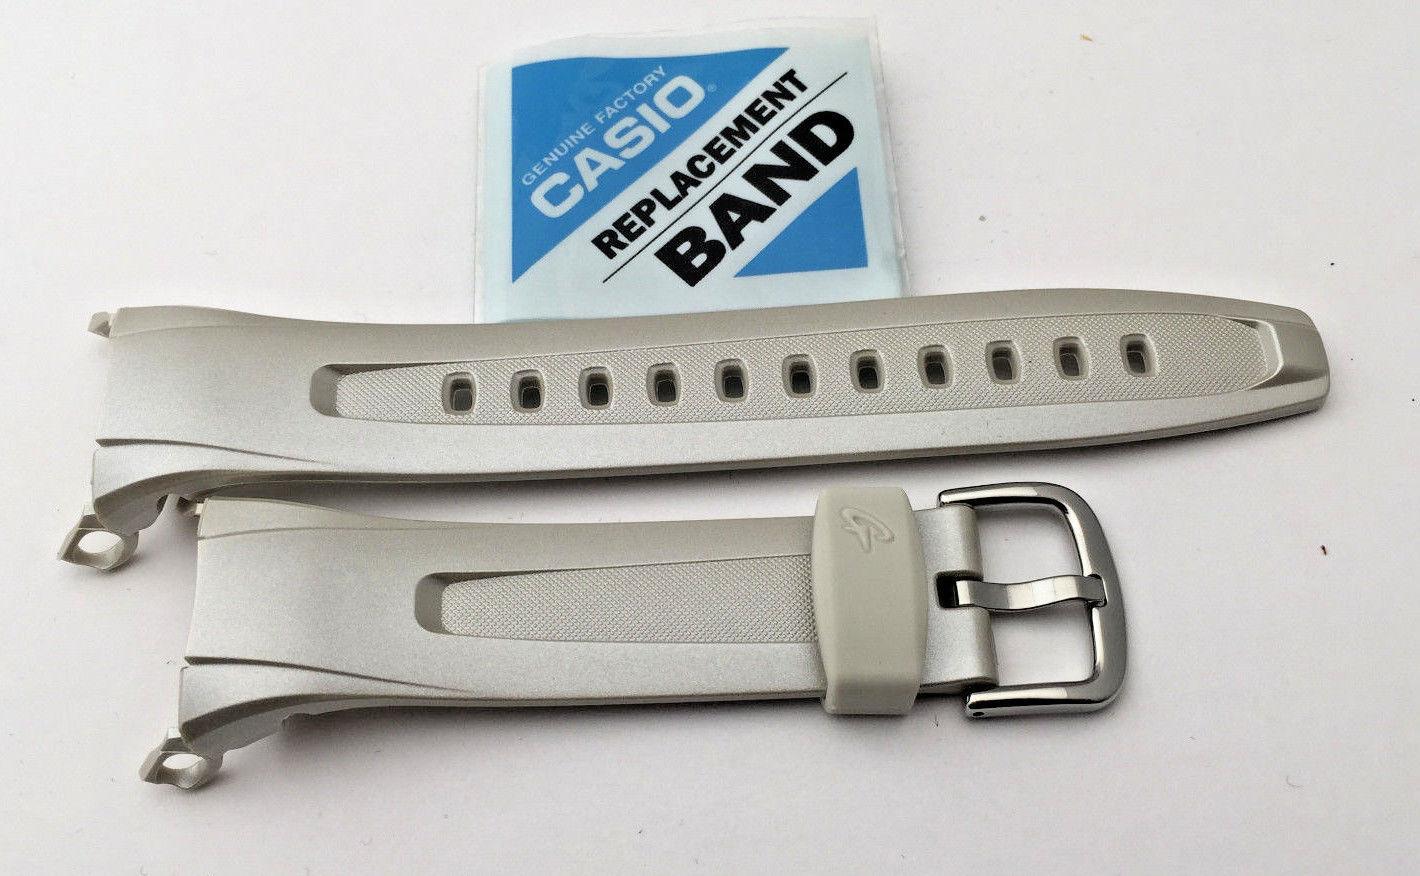 Casio Watch Band Strap G Shock Bgt3001 8b And 15 Similar Items Protrek Prg 280 2 Original S L1600